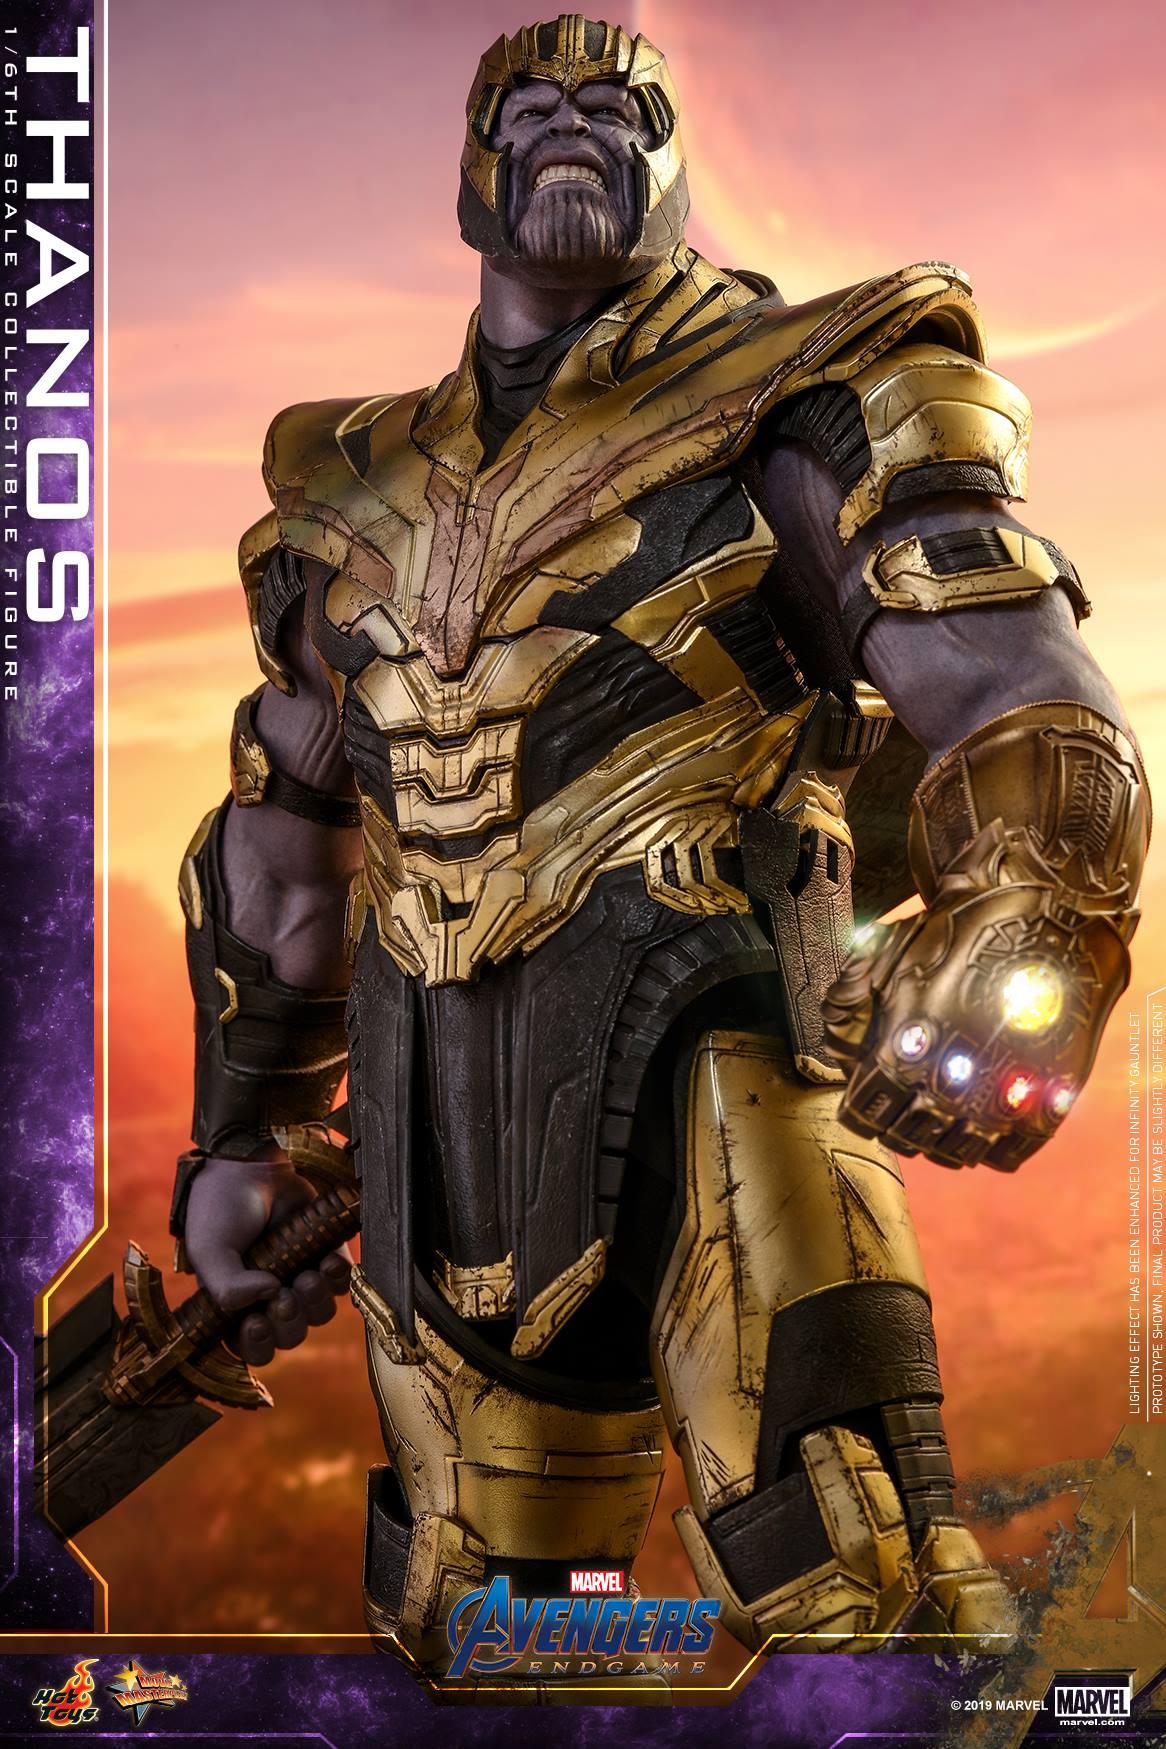 Hot Toys 1/6 Thanos (Avengers: Endgame)